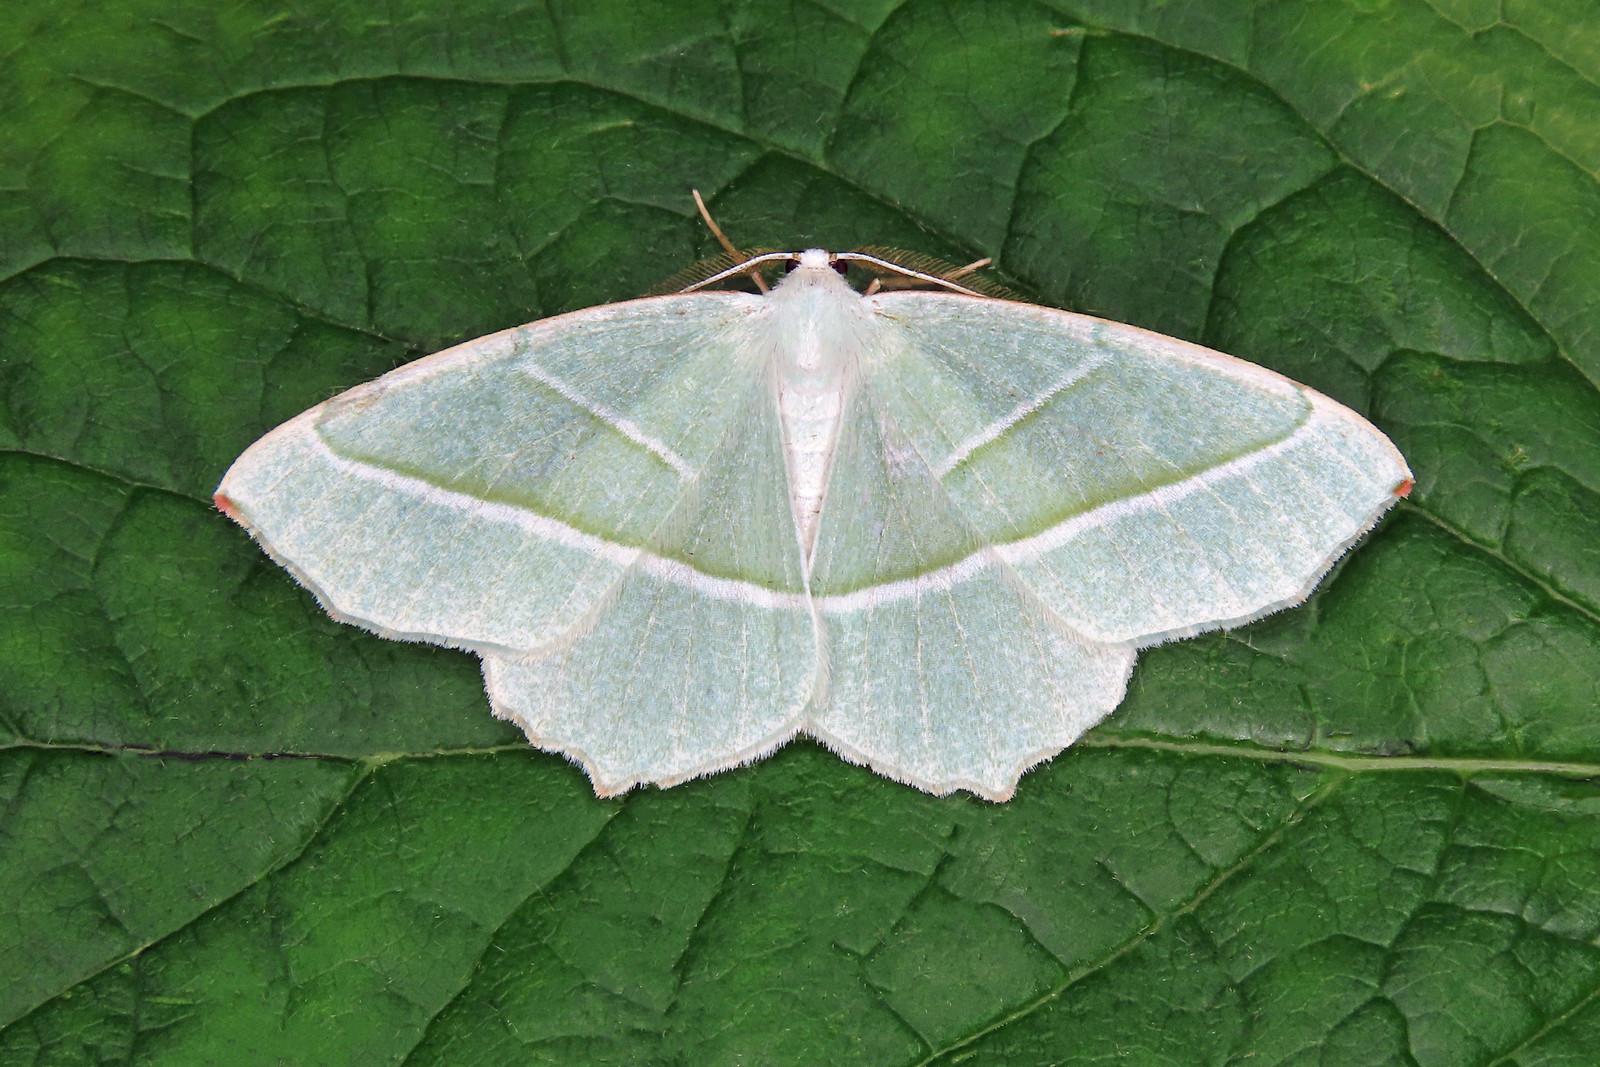 70.283 Light Emerald - Campaea margaritaria